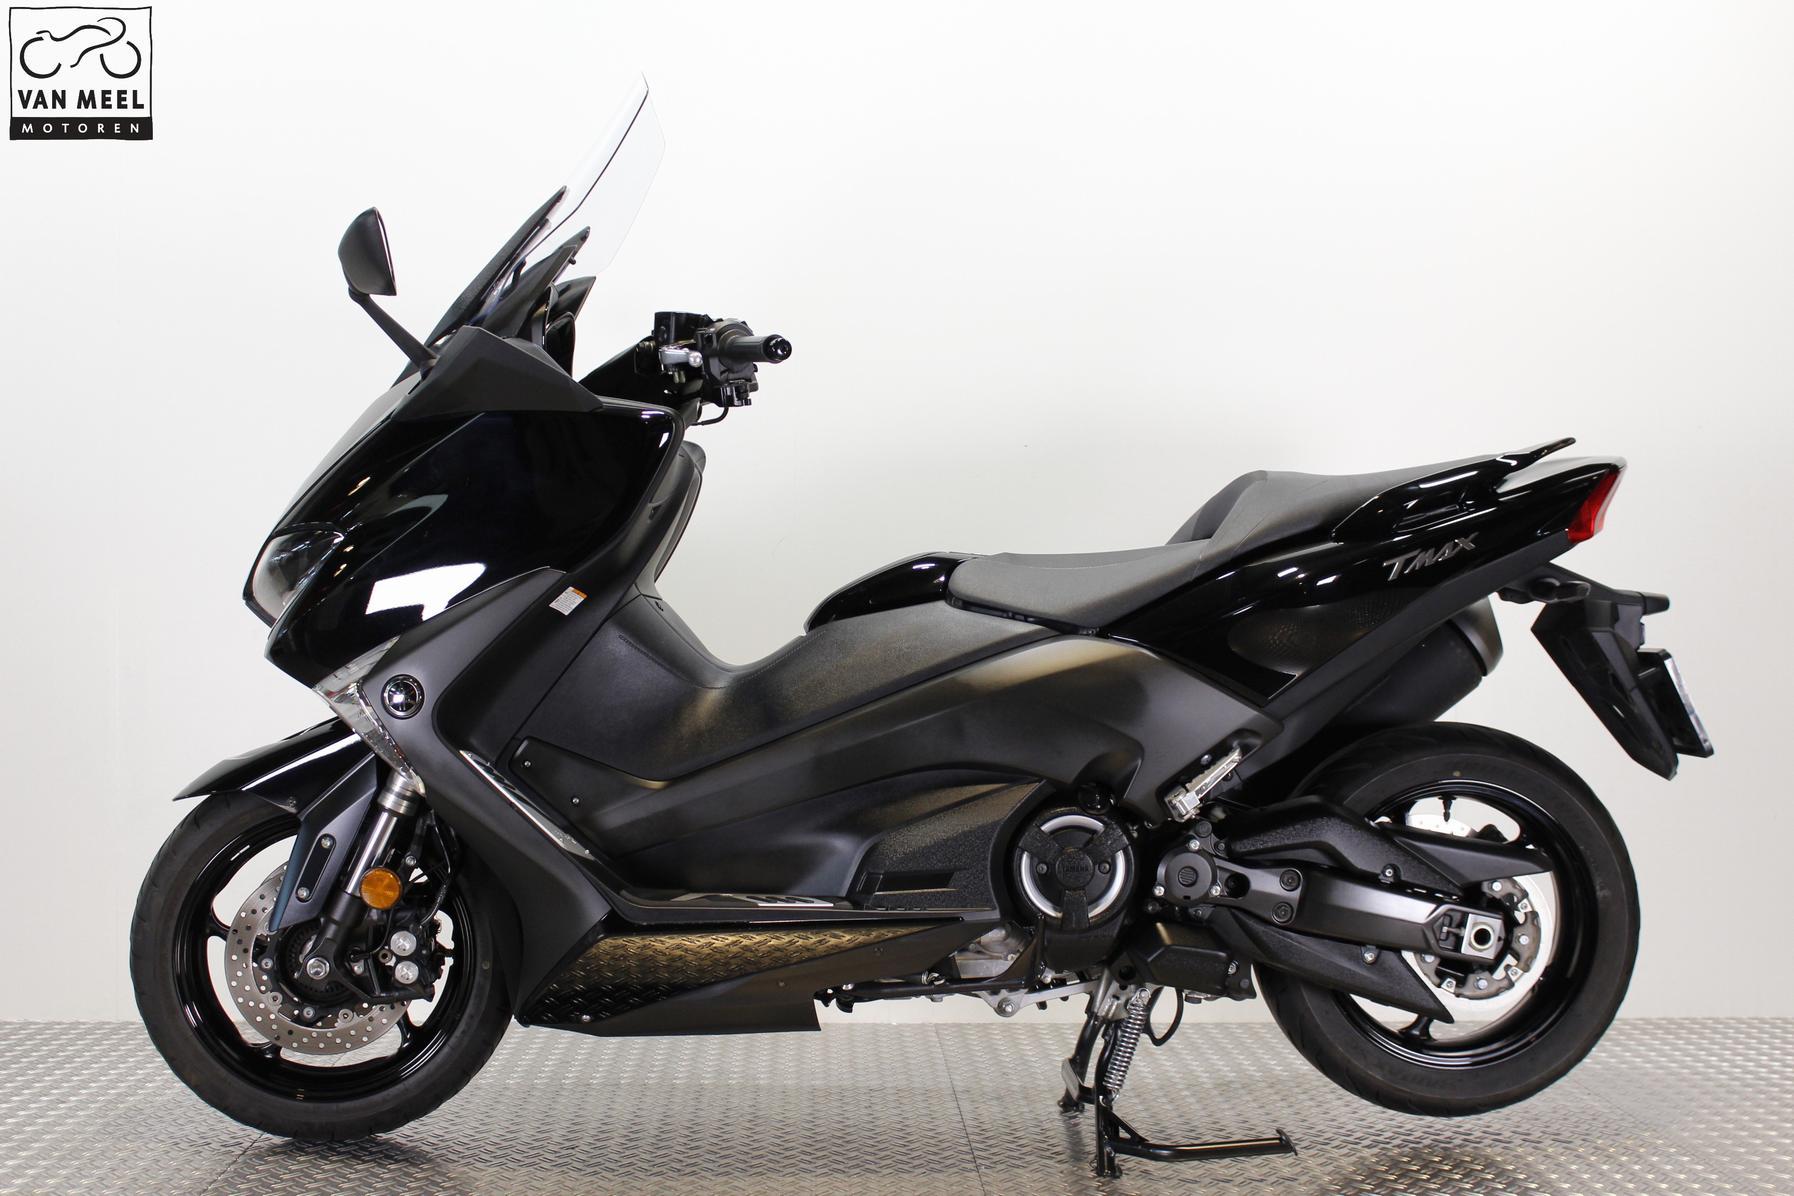 YAMAHA - T-Max 530 ABS